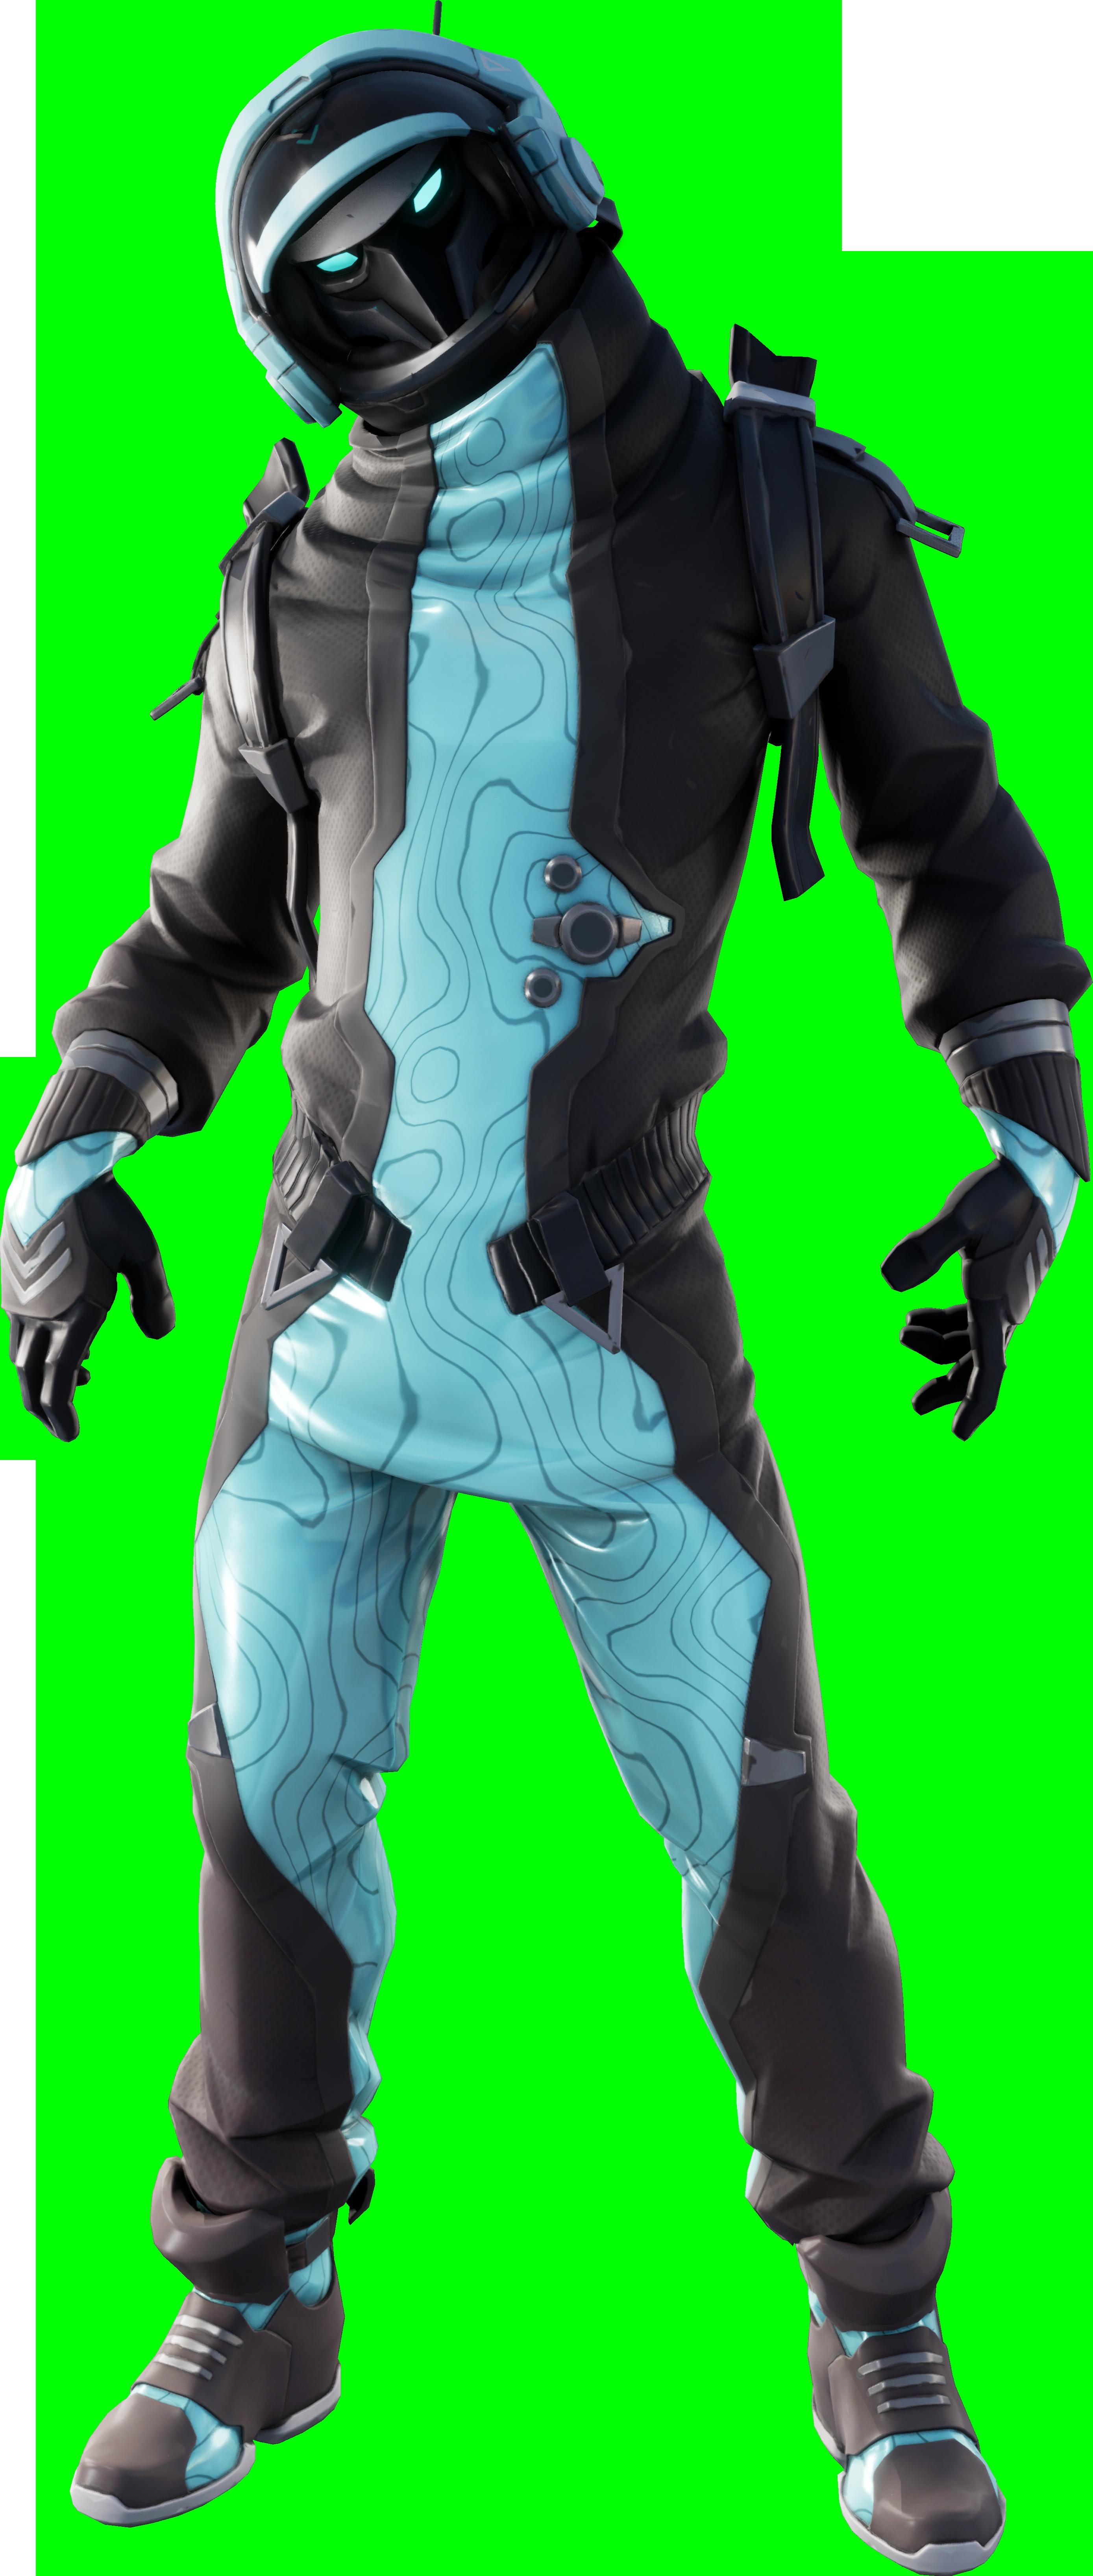 Fortnite Season X All Battle Pass Skins